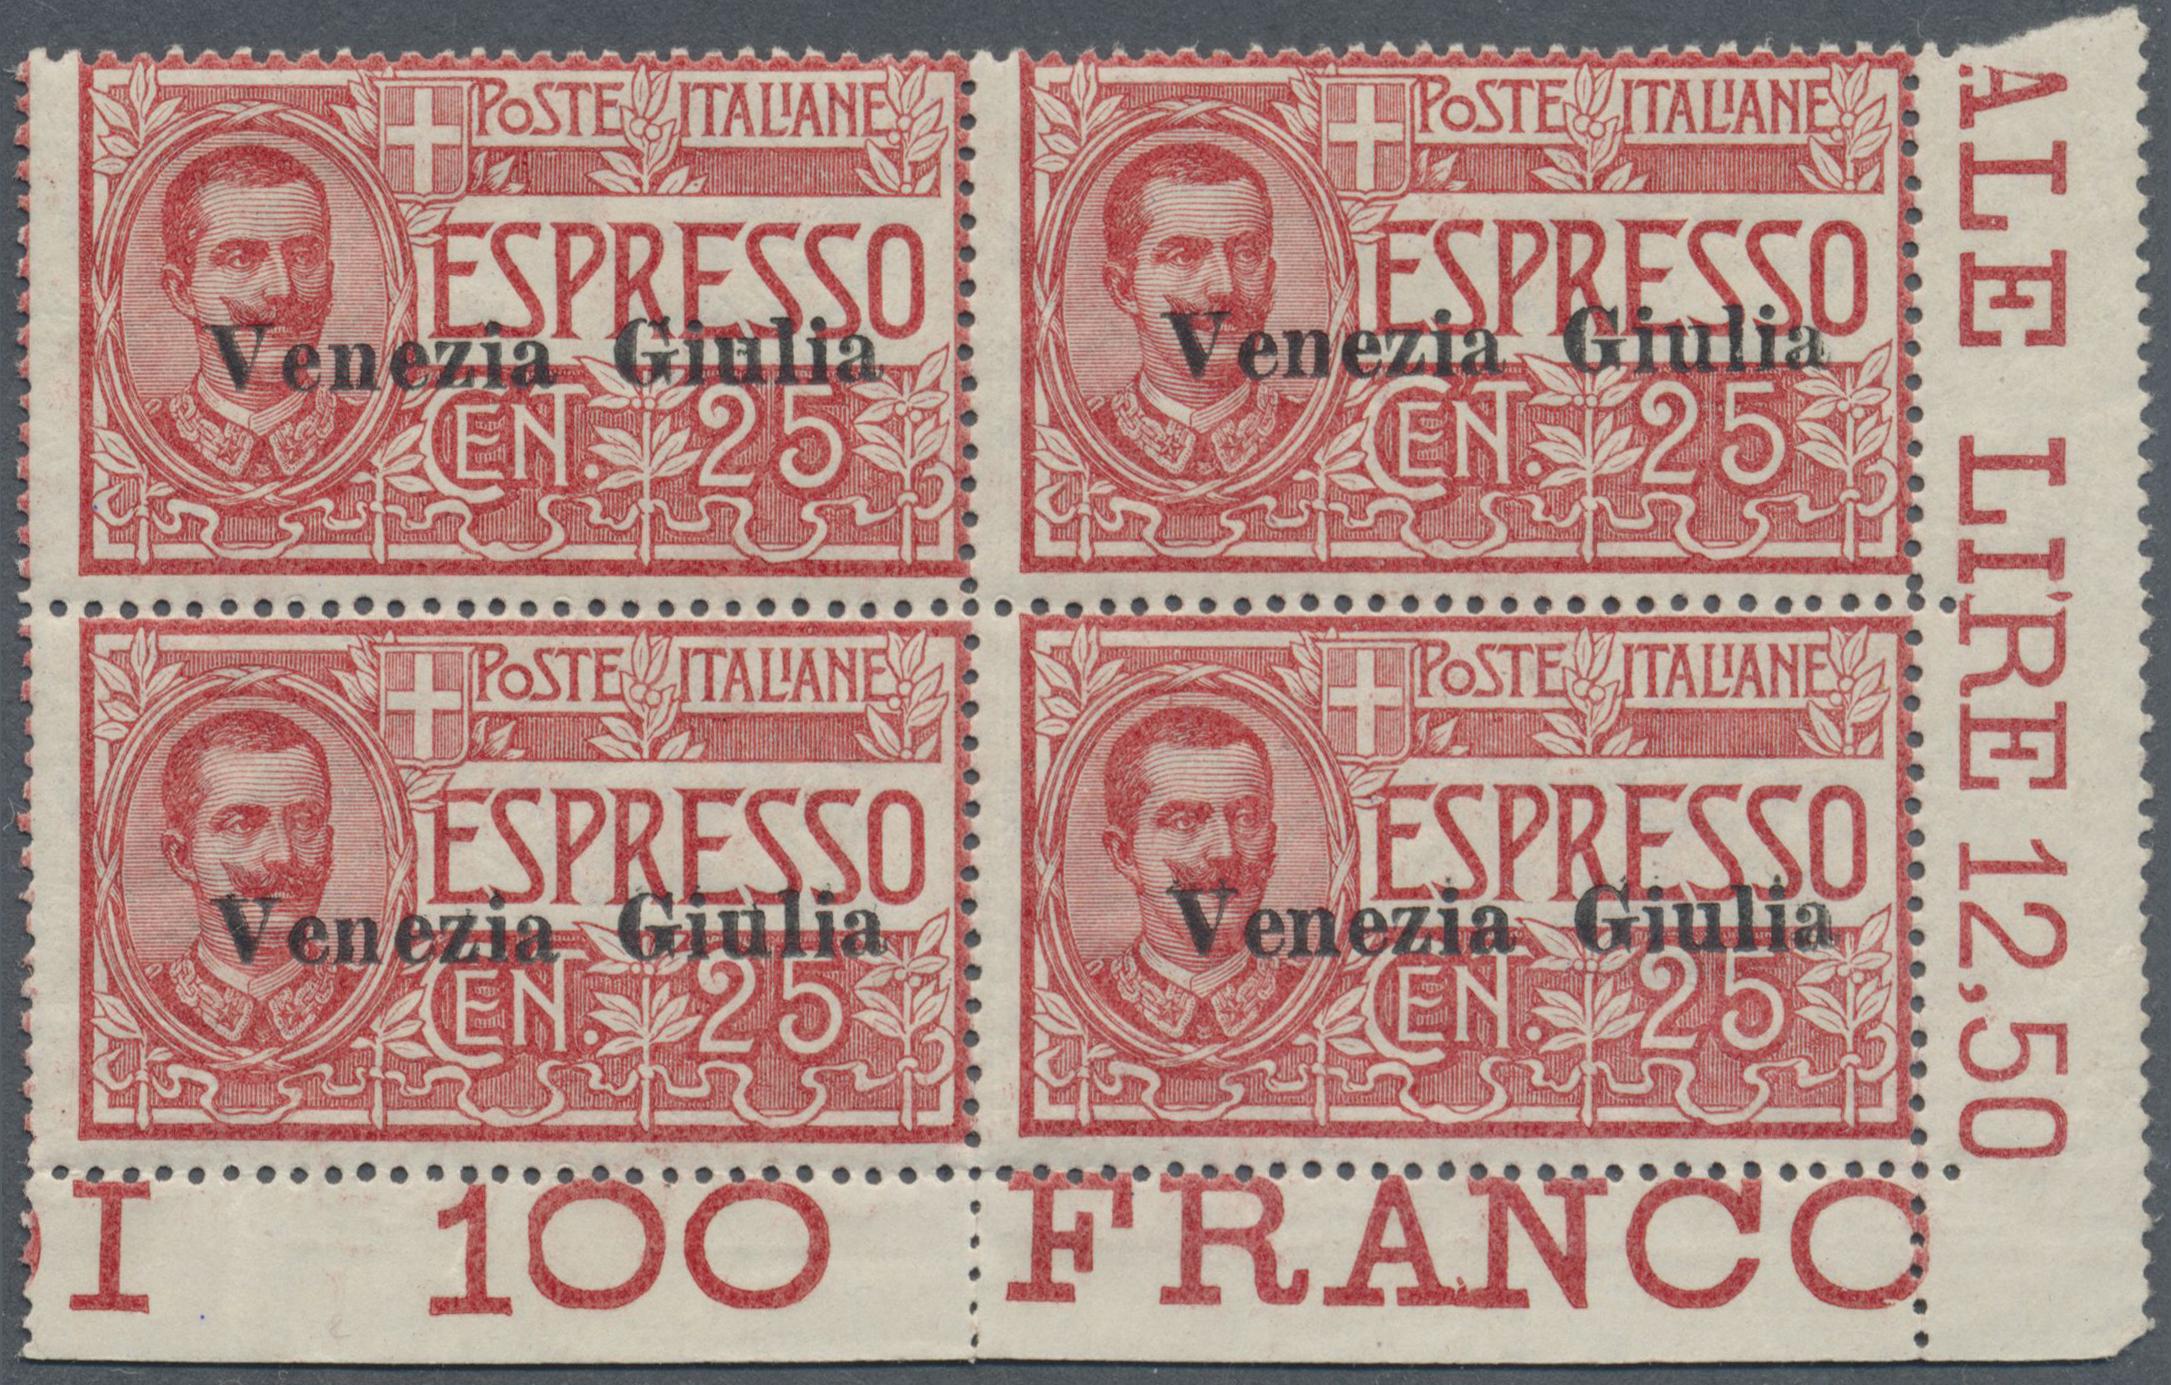 Lot 17131 - Italienische Besetzung 1918/23 - Julisch-Venetien  -  Auktionshaus Christoph Gärtner GmbH & Co. KG Single lots Philately Overseas & Europe. Auction #39 Day 4